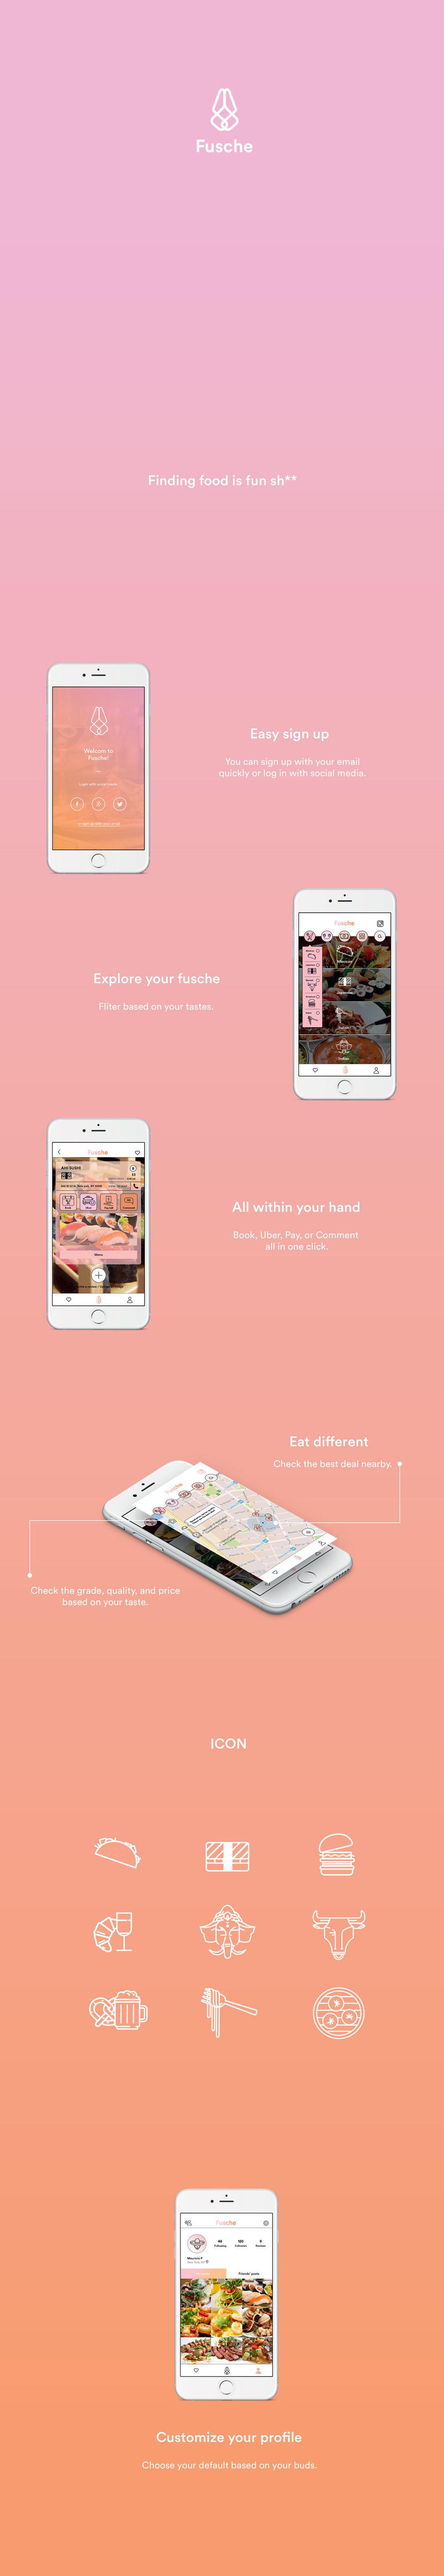 Fusche Branding and UX/UI Design Overview